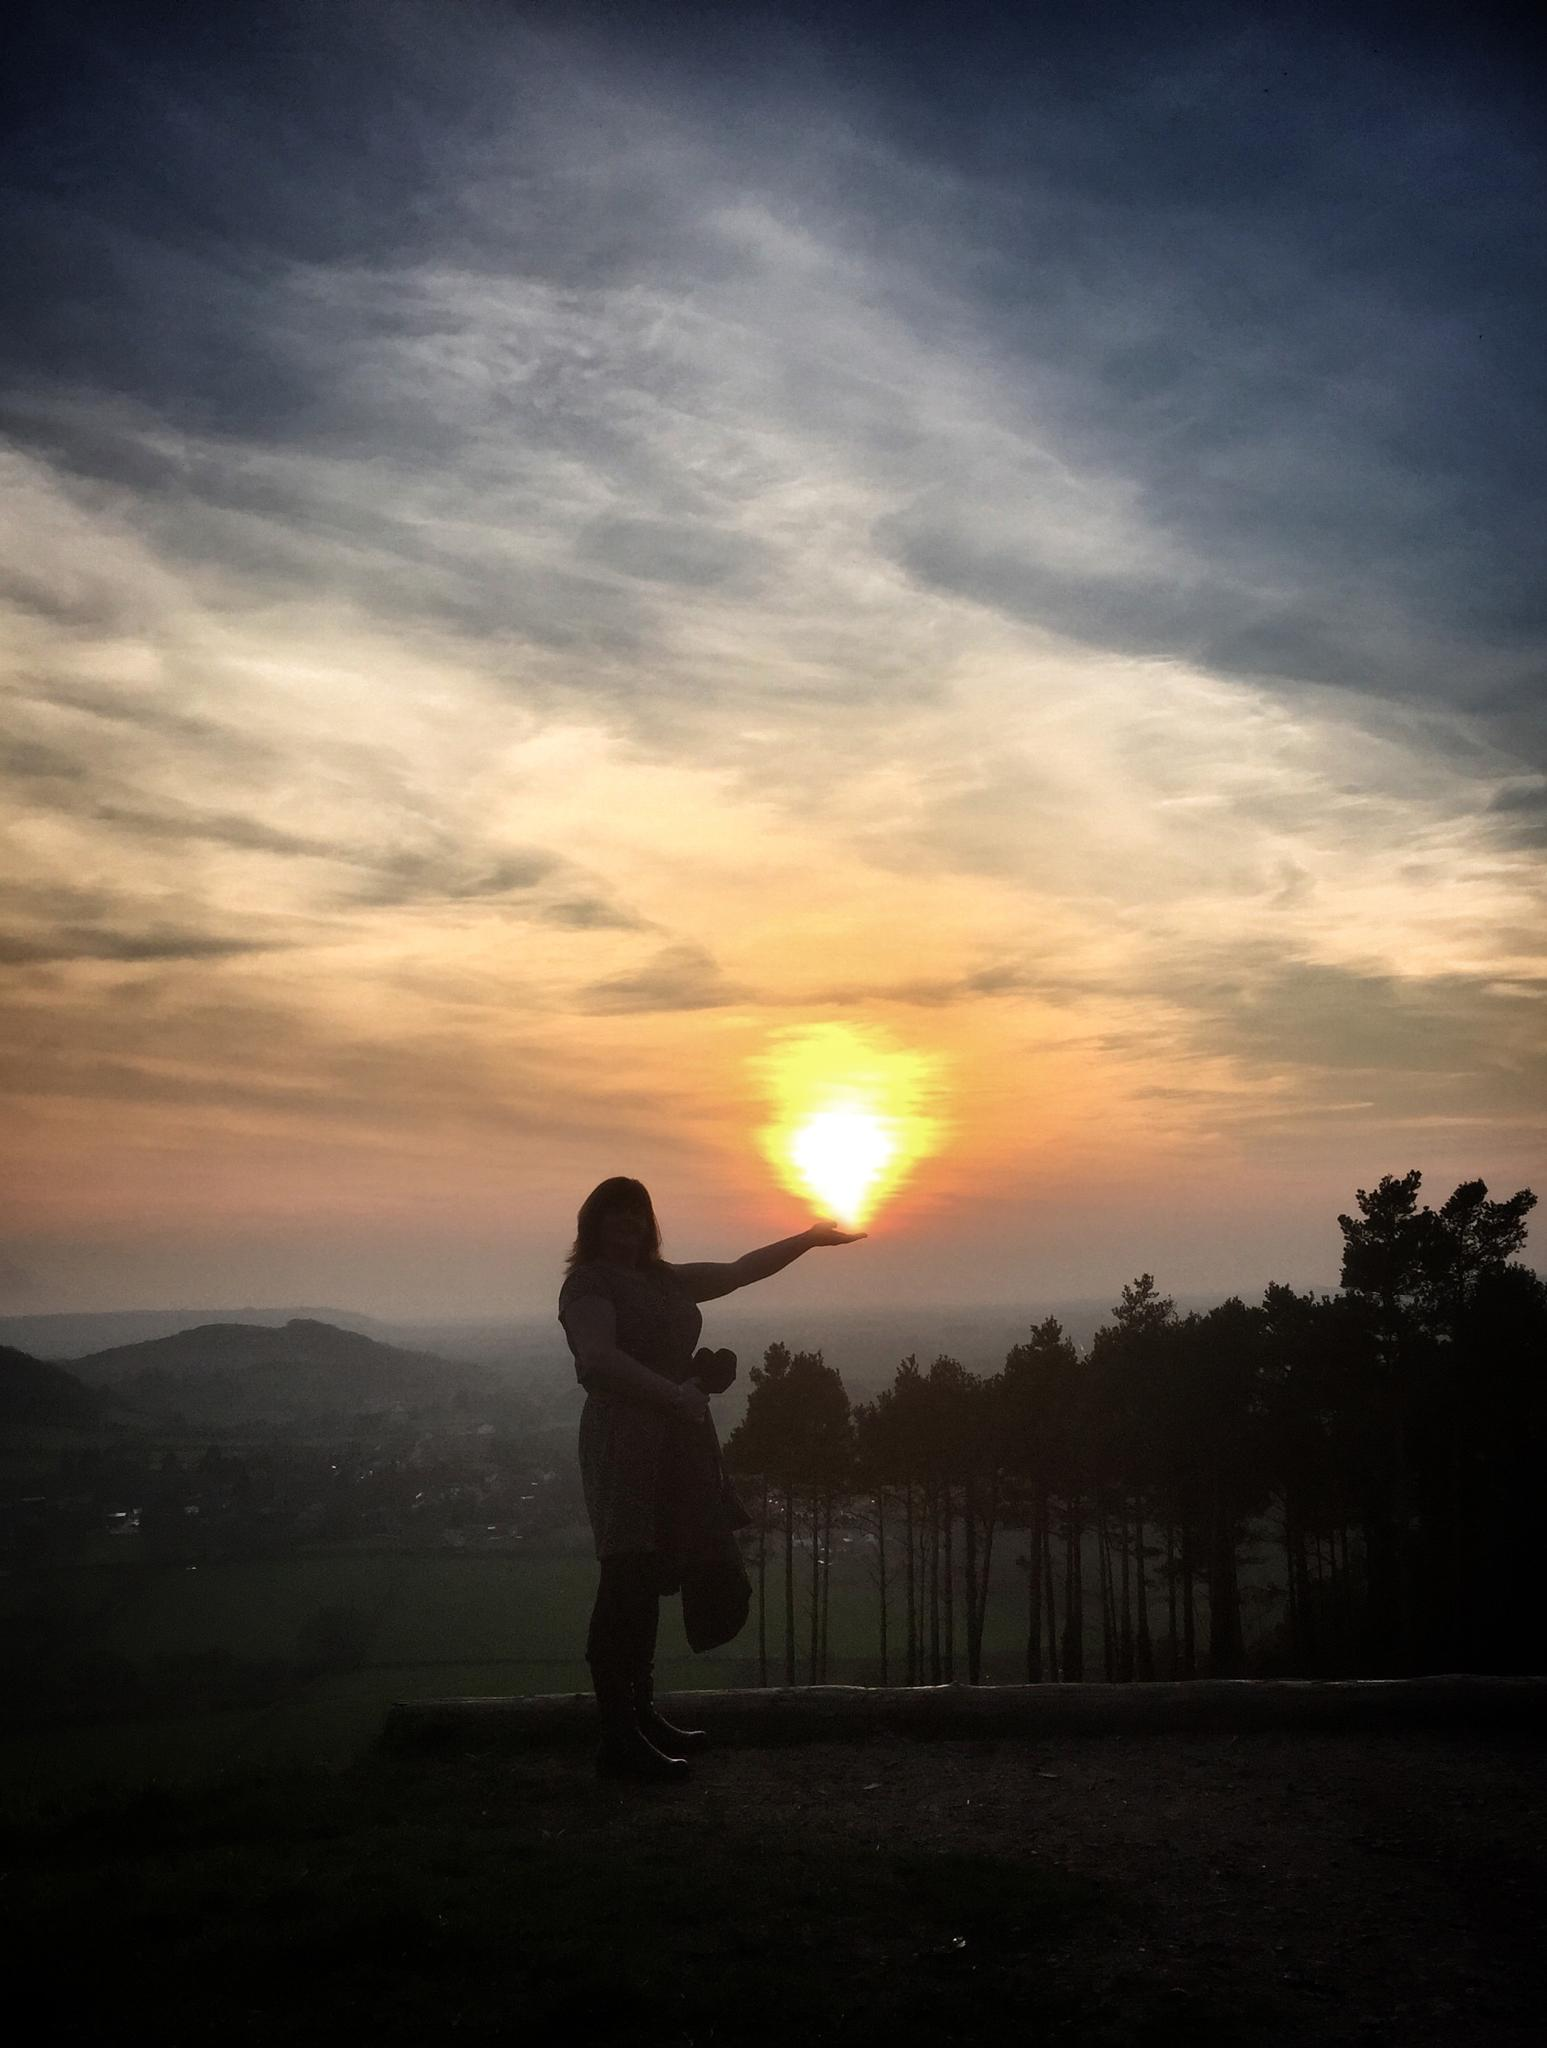 Flaming sunset  by debi.Moss.3